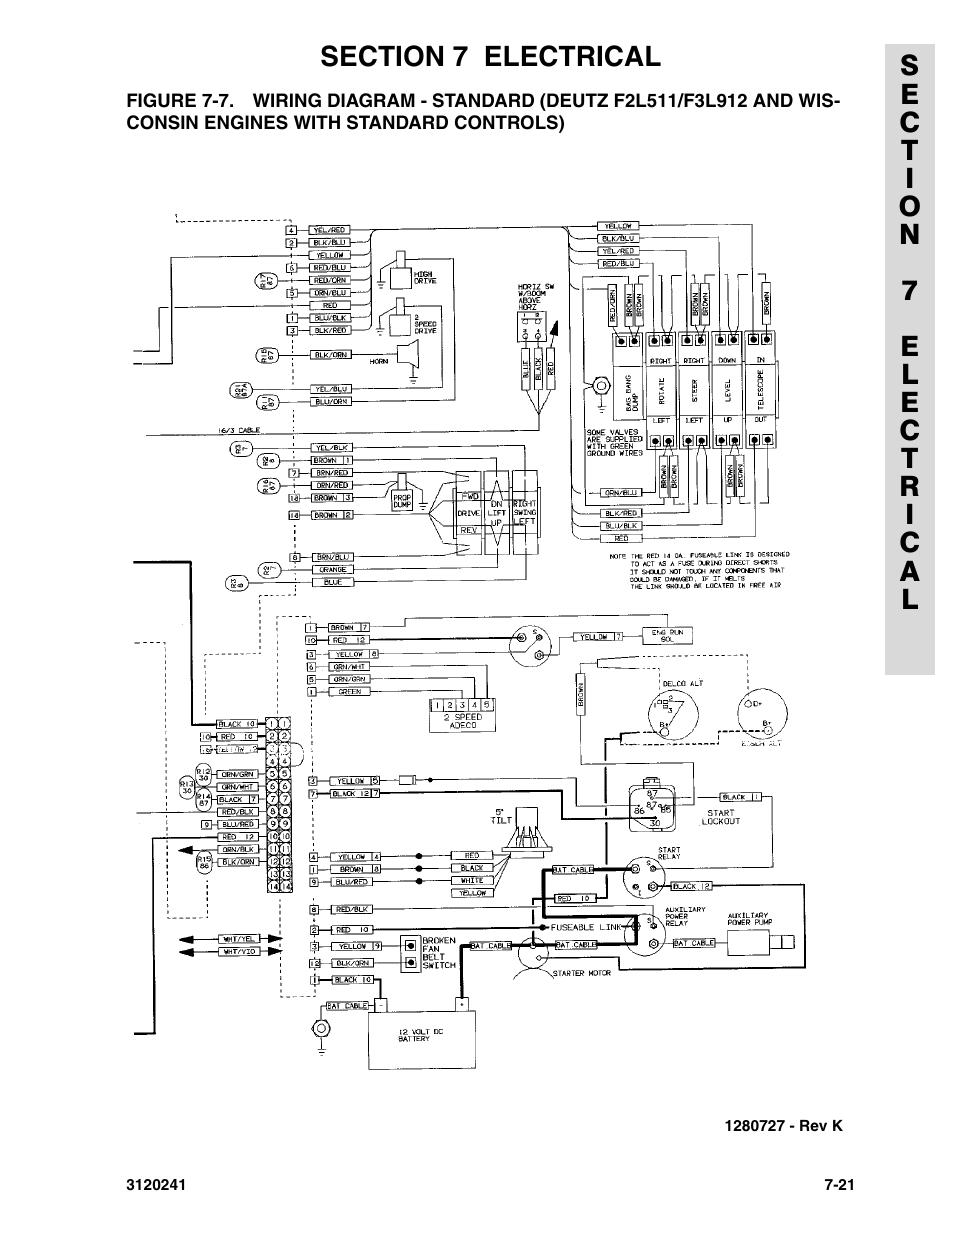 siemens fs 250 wiring diagram dcs wiring diagram  u2022 free